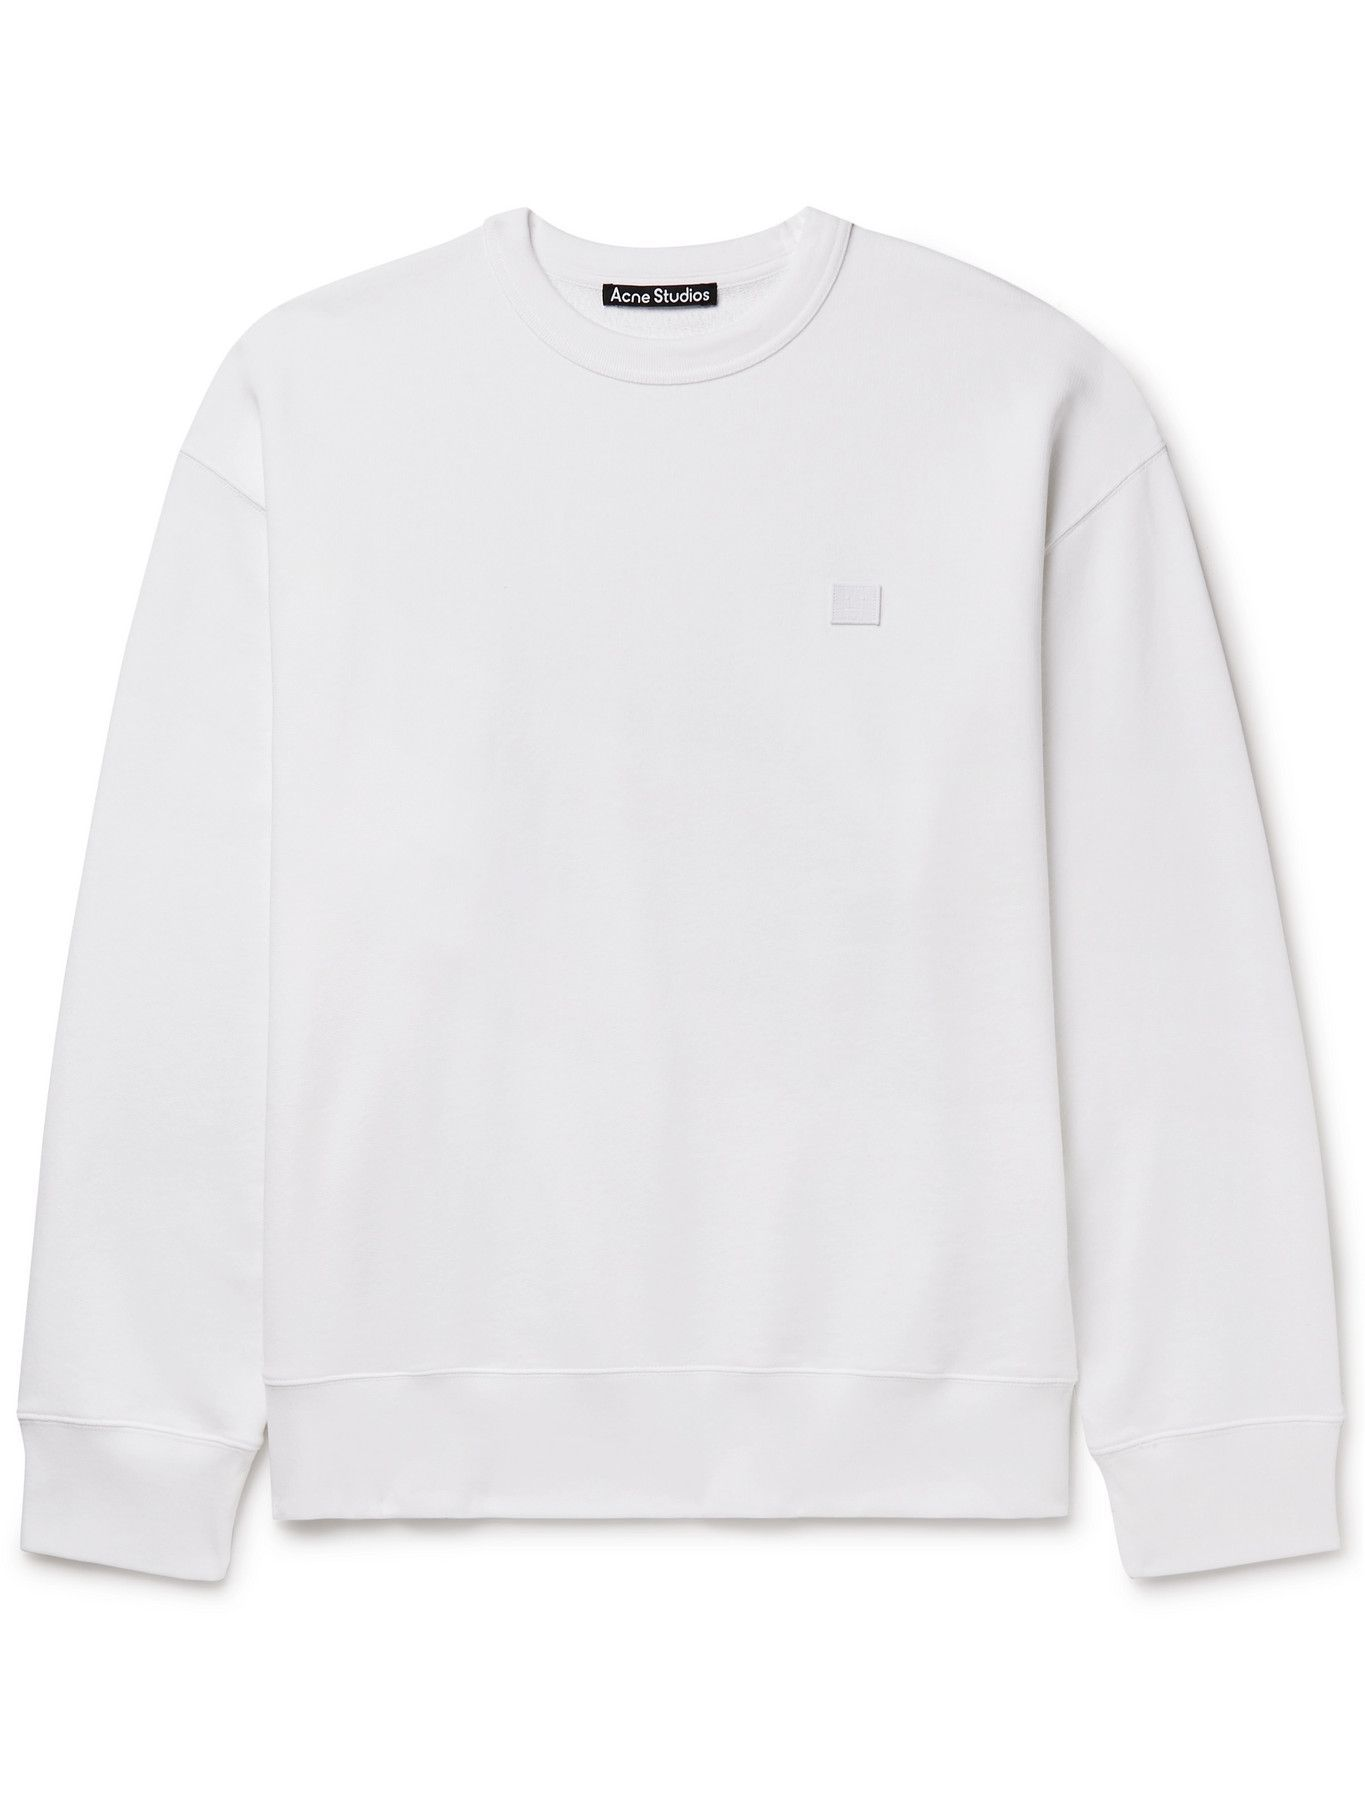 Photo: ACNE STUDIOS - Forba Logo-Appliquéd Cotton-Jersey Sweatshirt - White